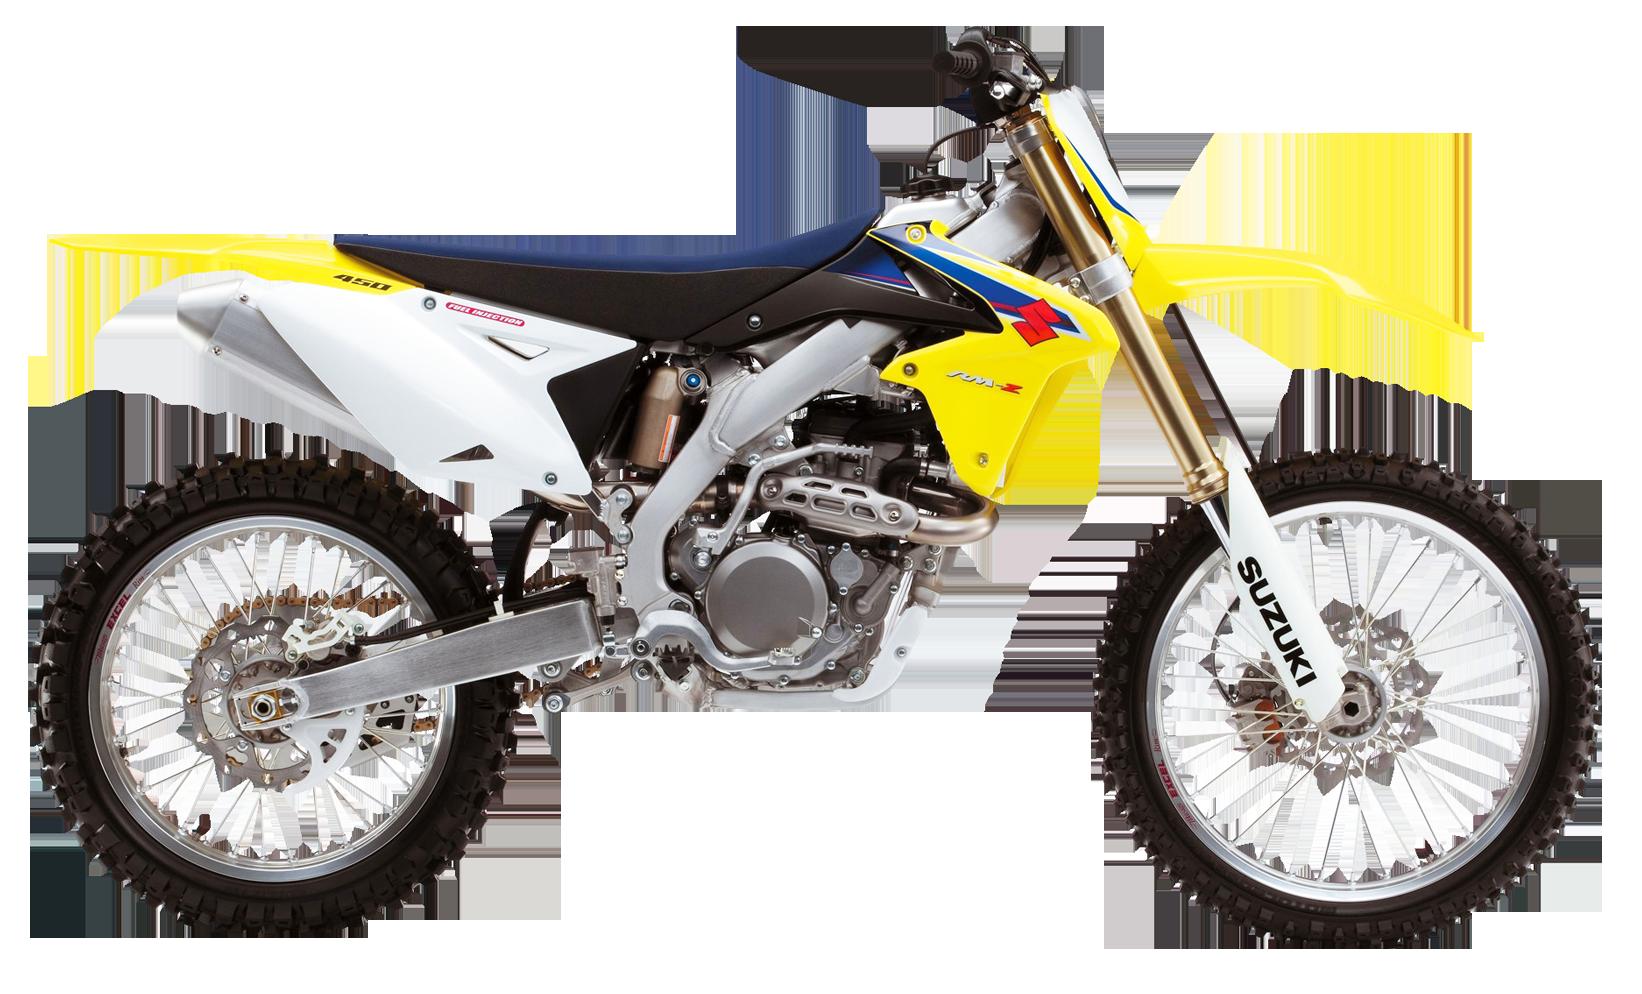 Suzuki Rm Z450 Png Image Suzuki Motocross Suzuki Motorcycle Motocross Bikes